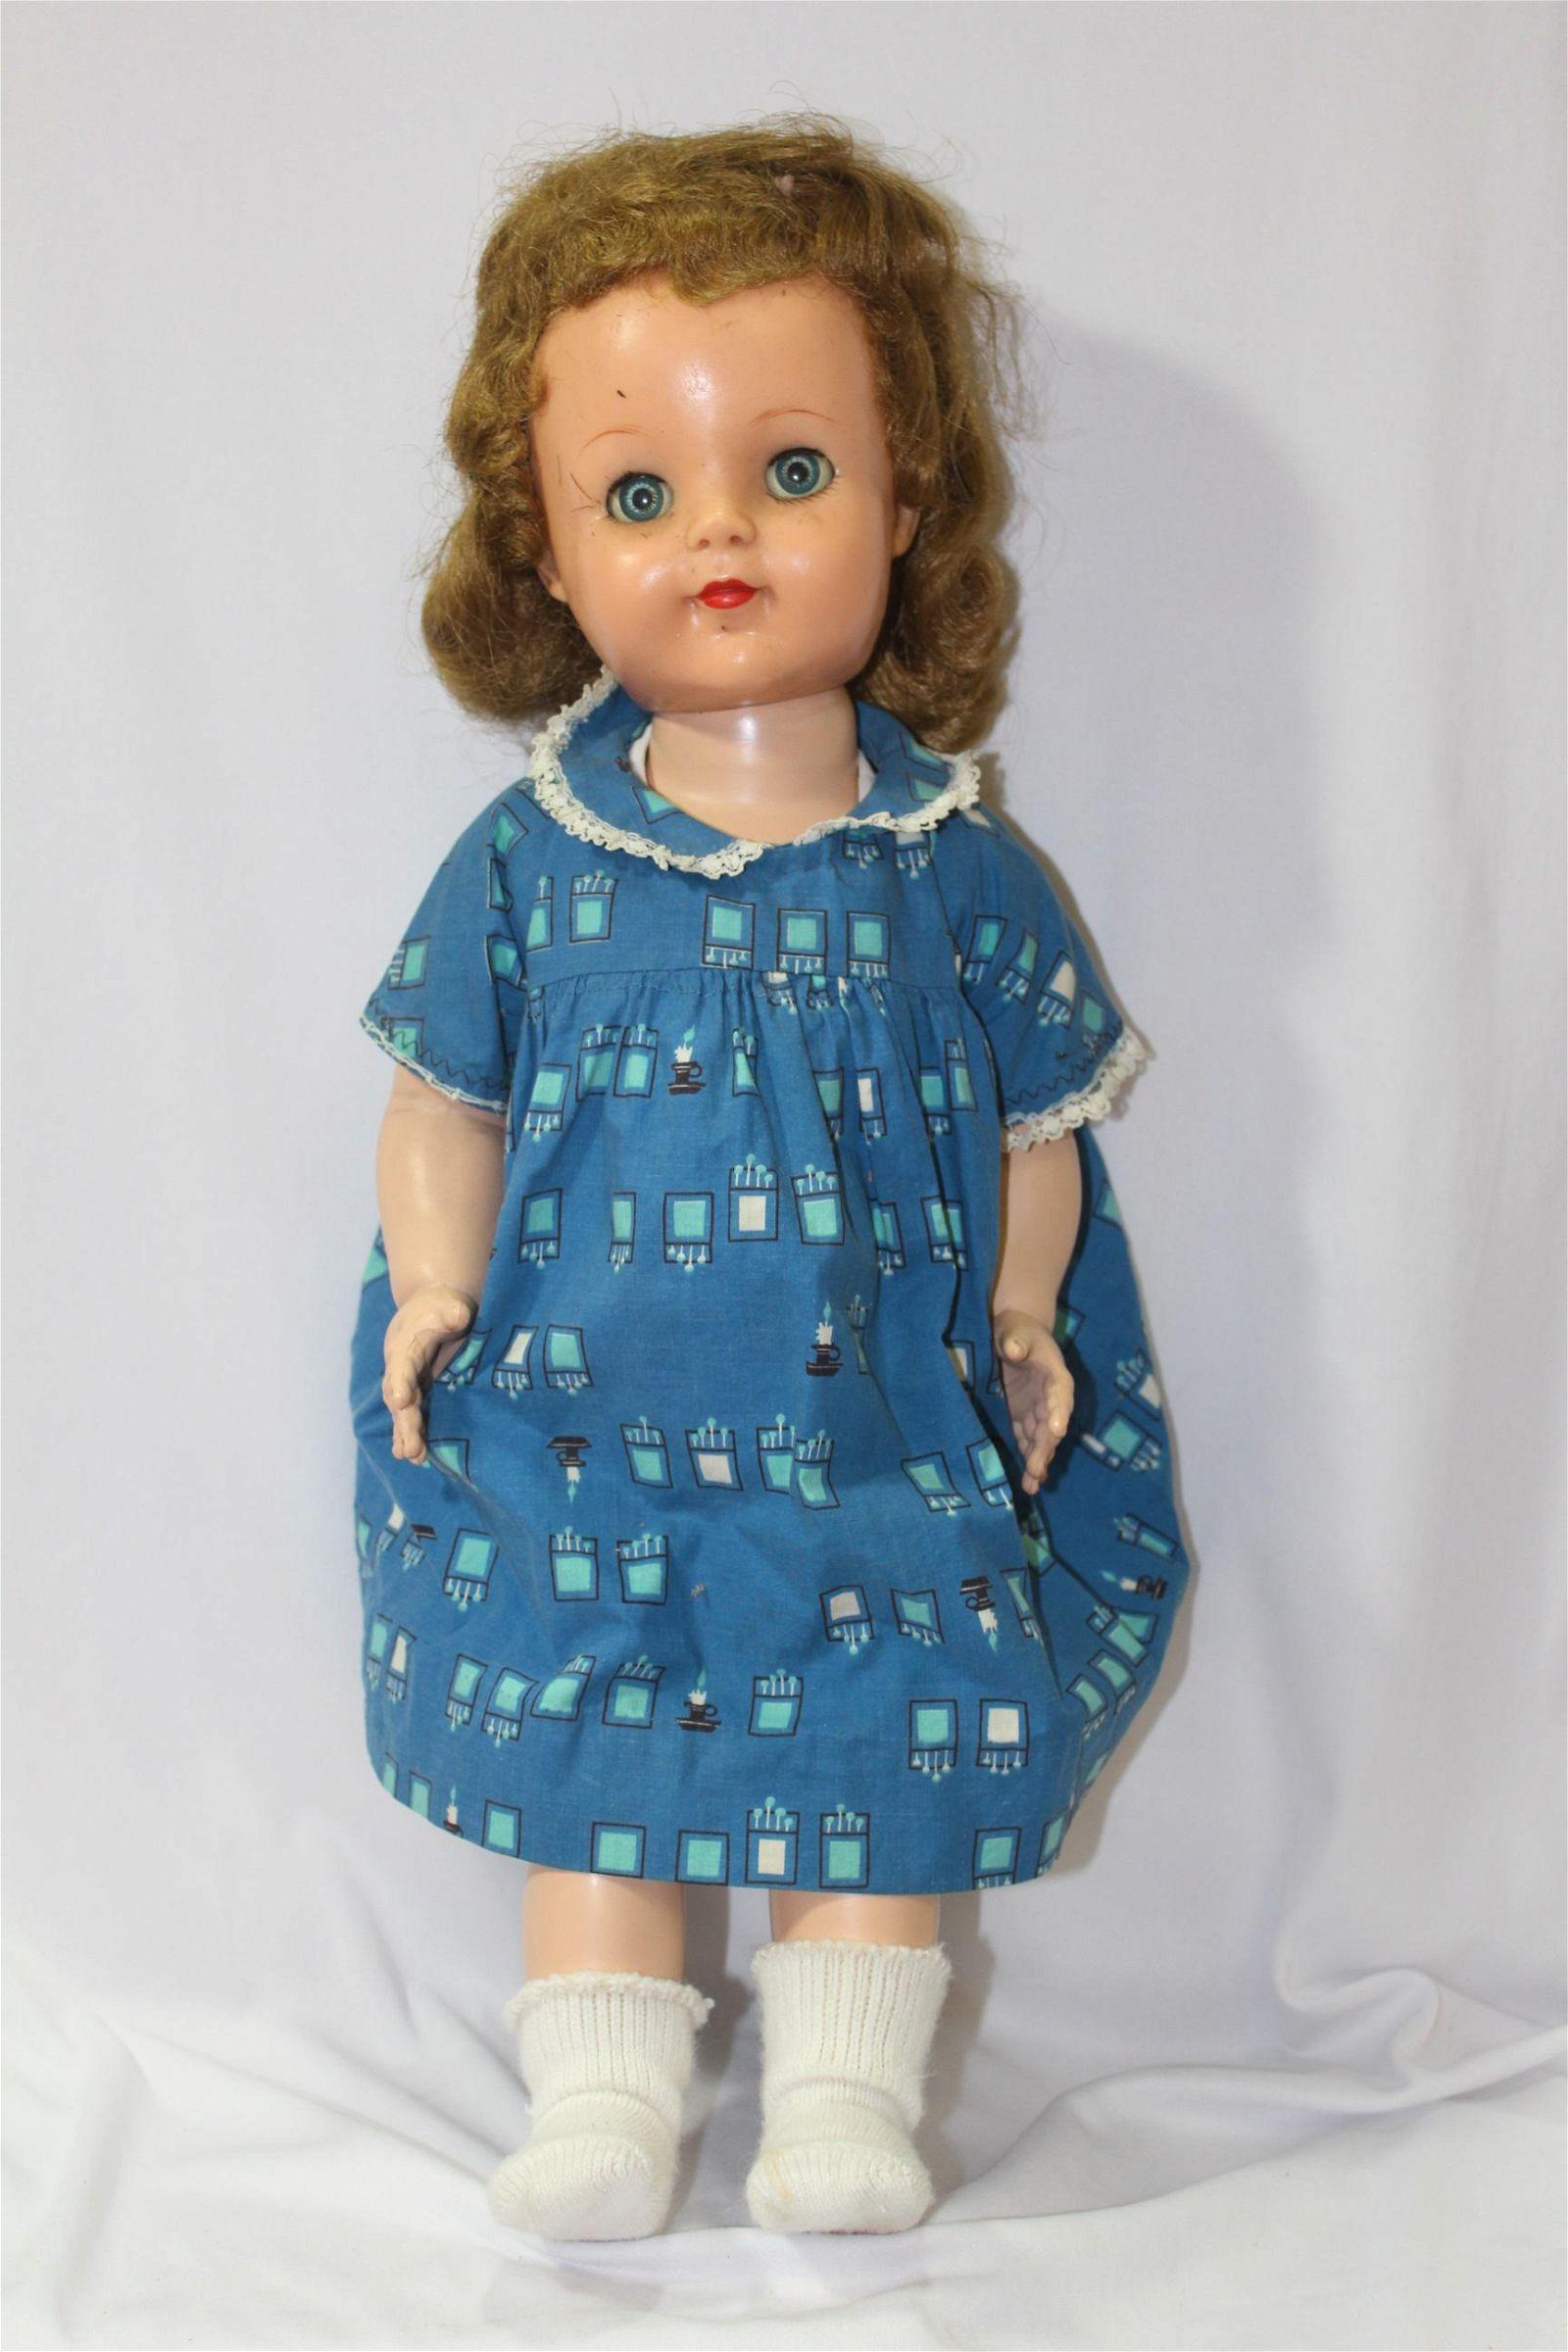 An Ideal Doll